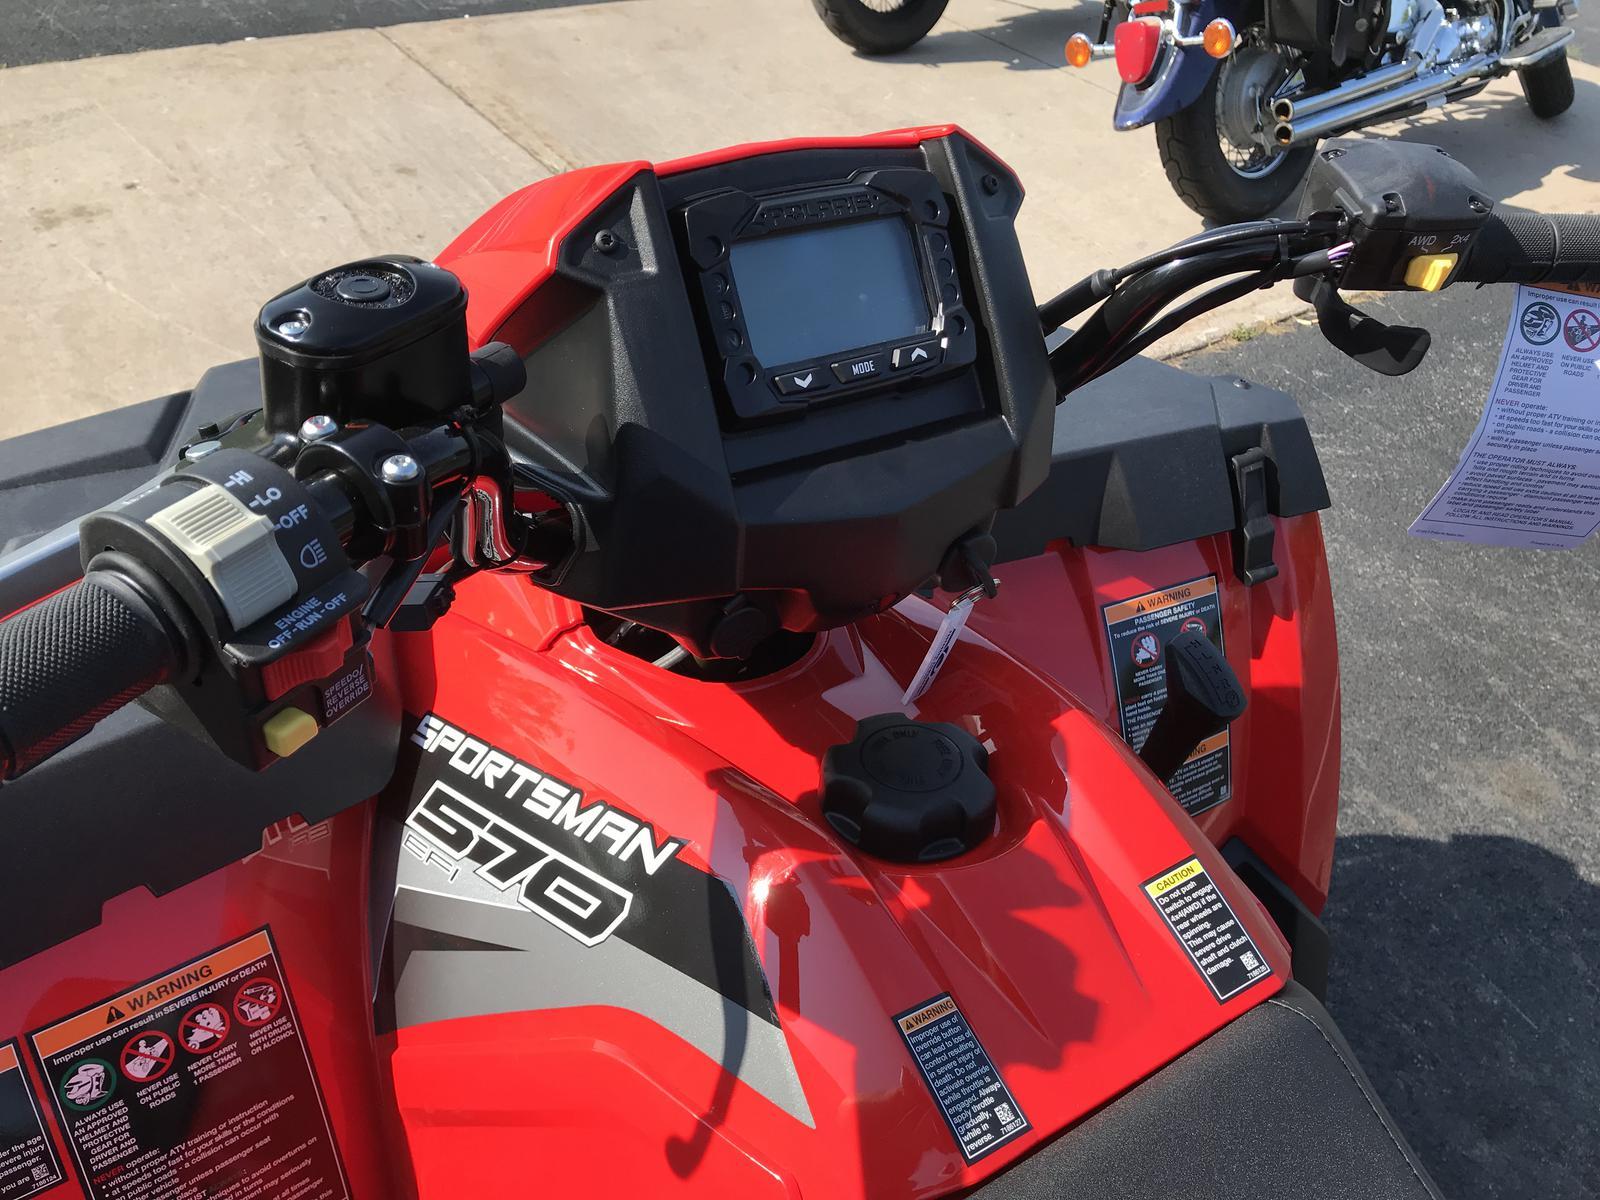 2019 Polaris Industries Sportsman Touring 570 - Indy Red